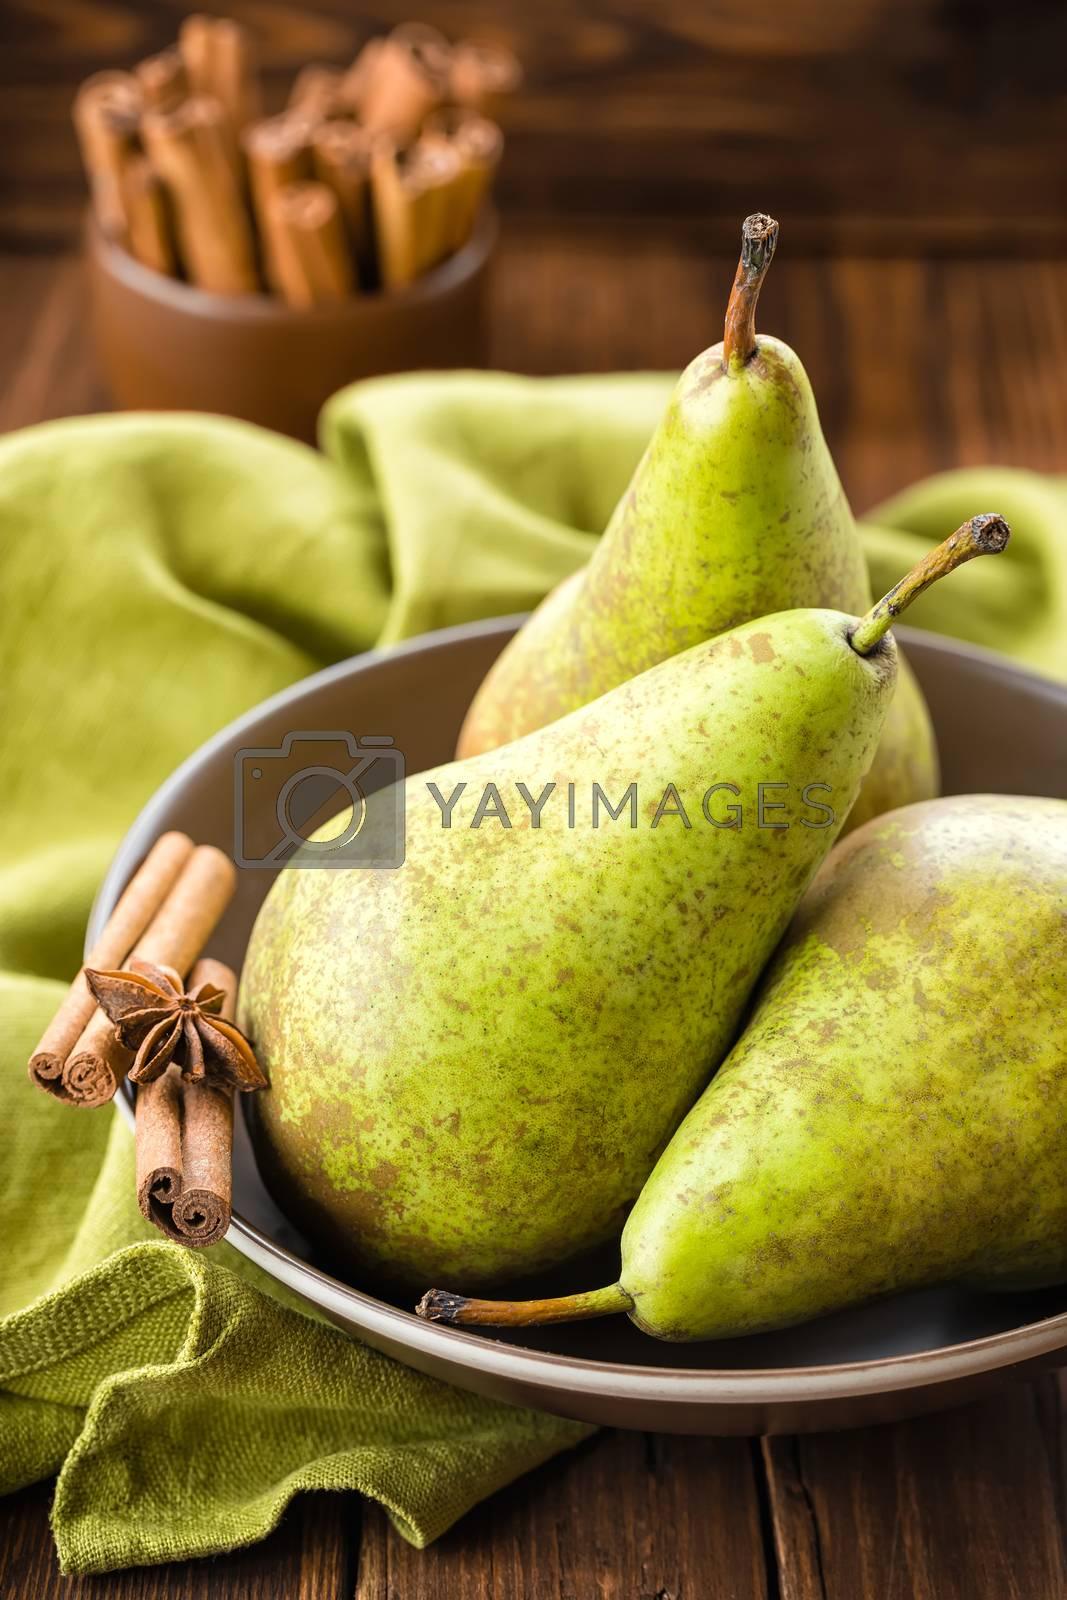 Royalty free image of Pears by yelenayemchuk